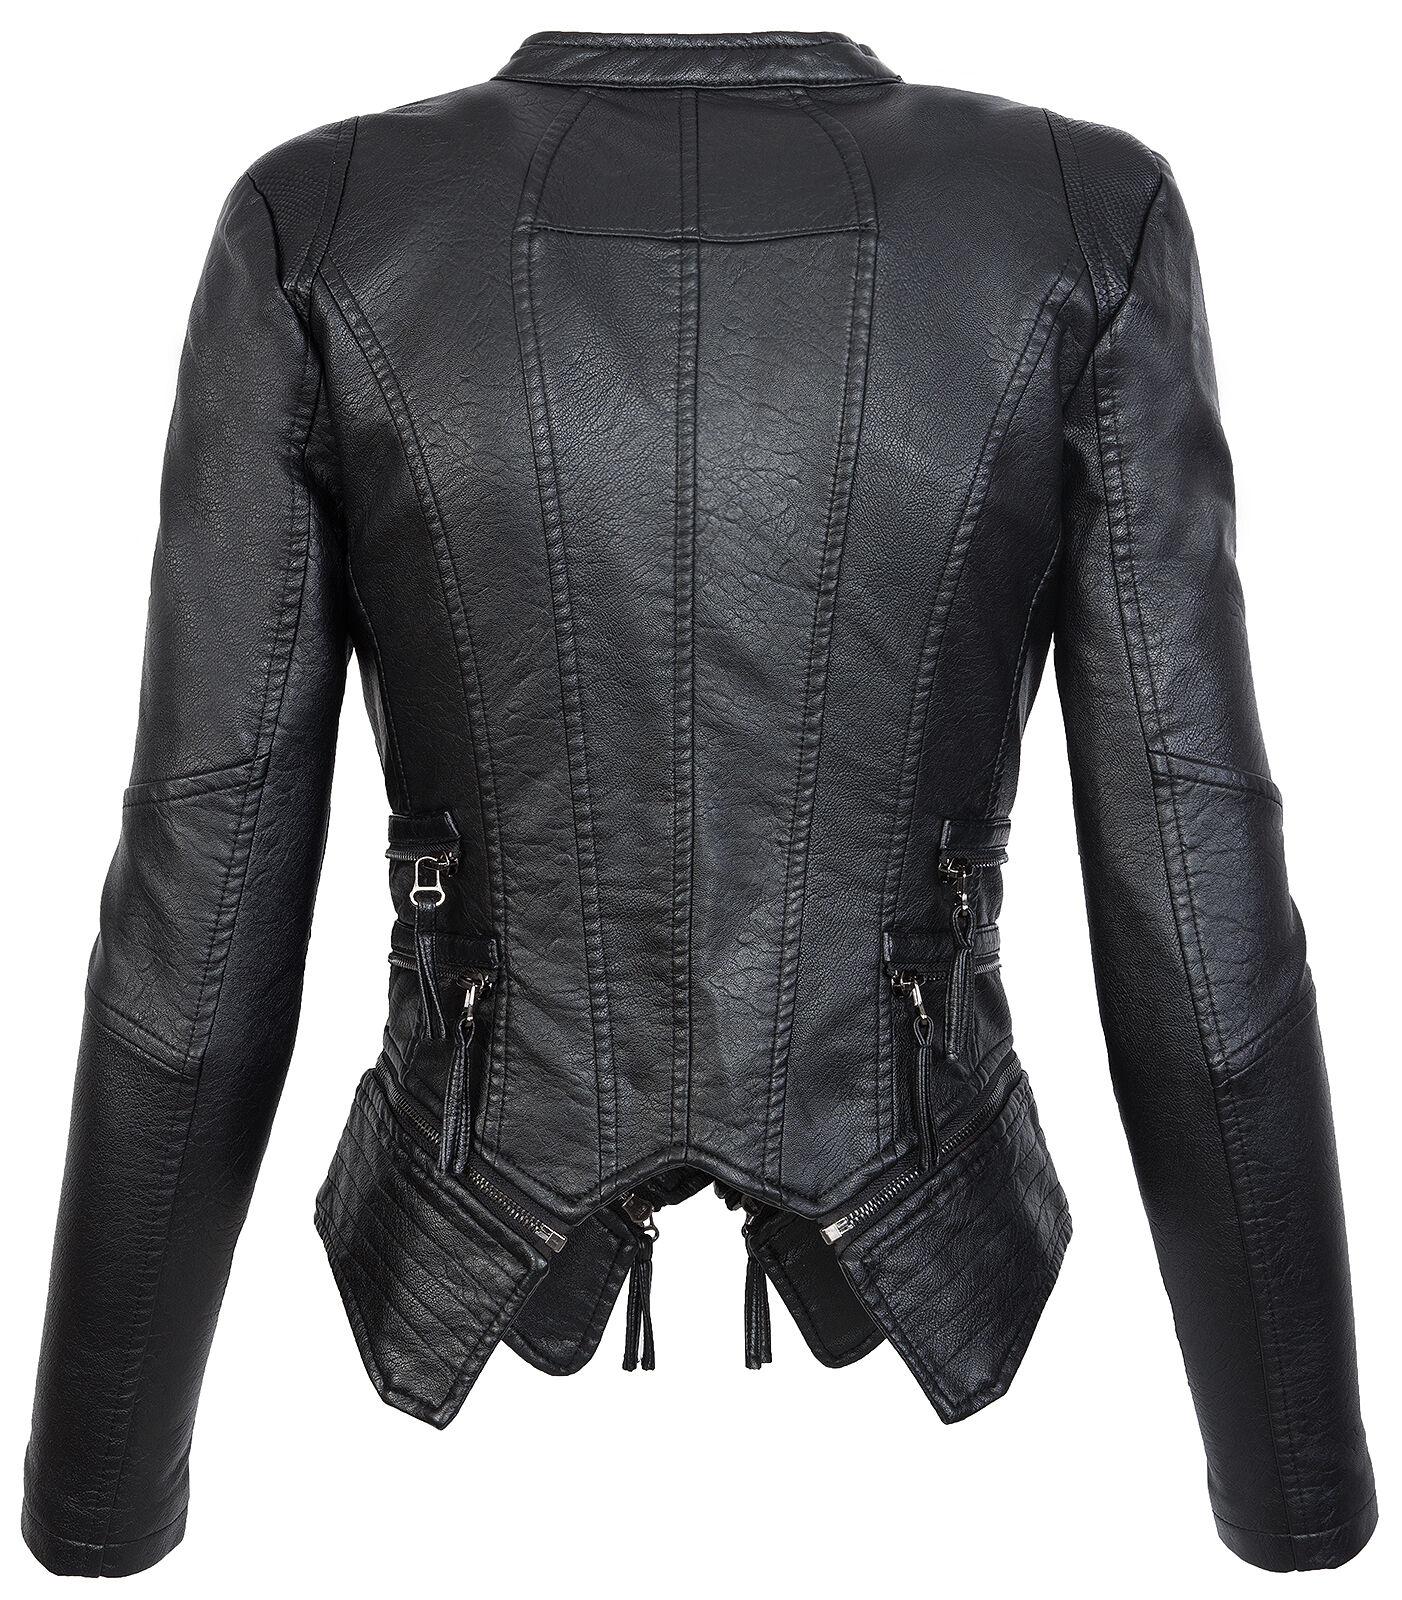 Damen Leder S D Jacke Jacke XL Bikerjacke 305 Übergangs Optik NEU Kunstleder 8knXw0ZNOP